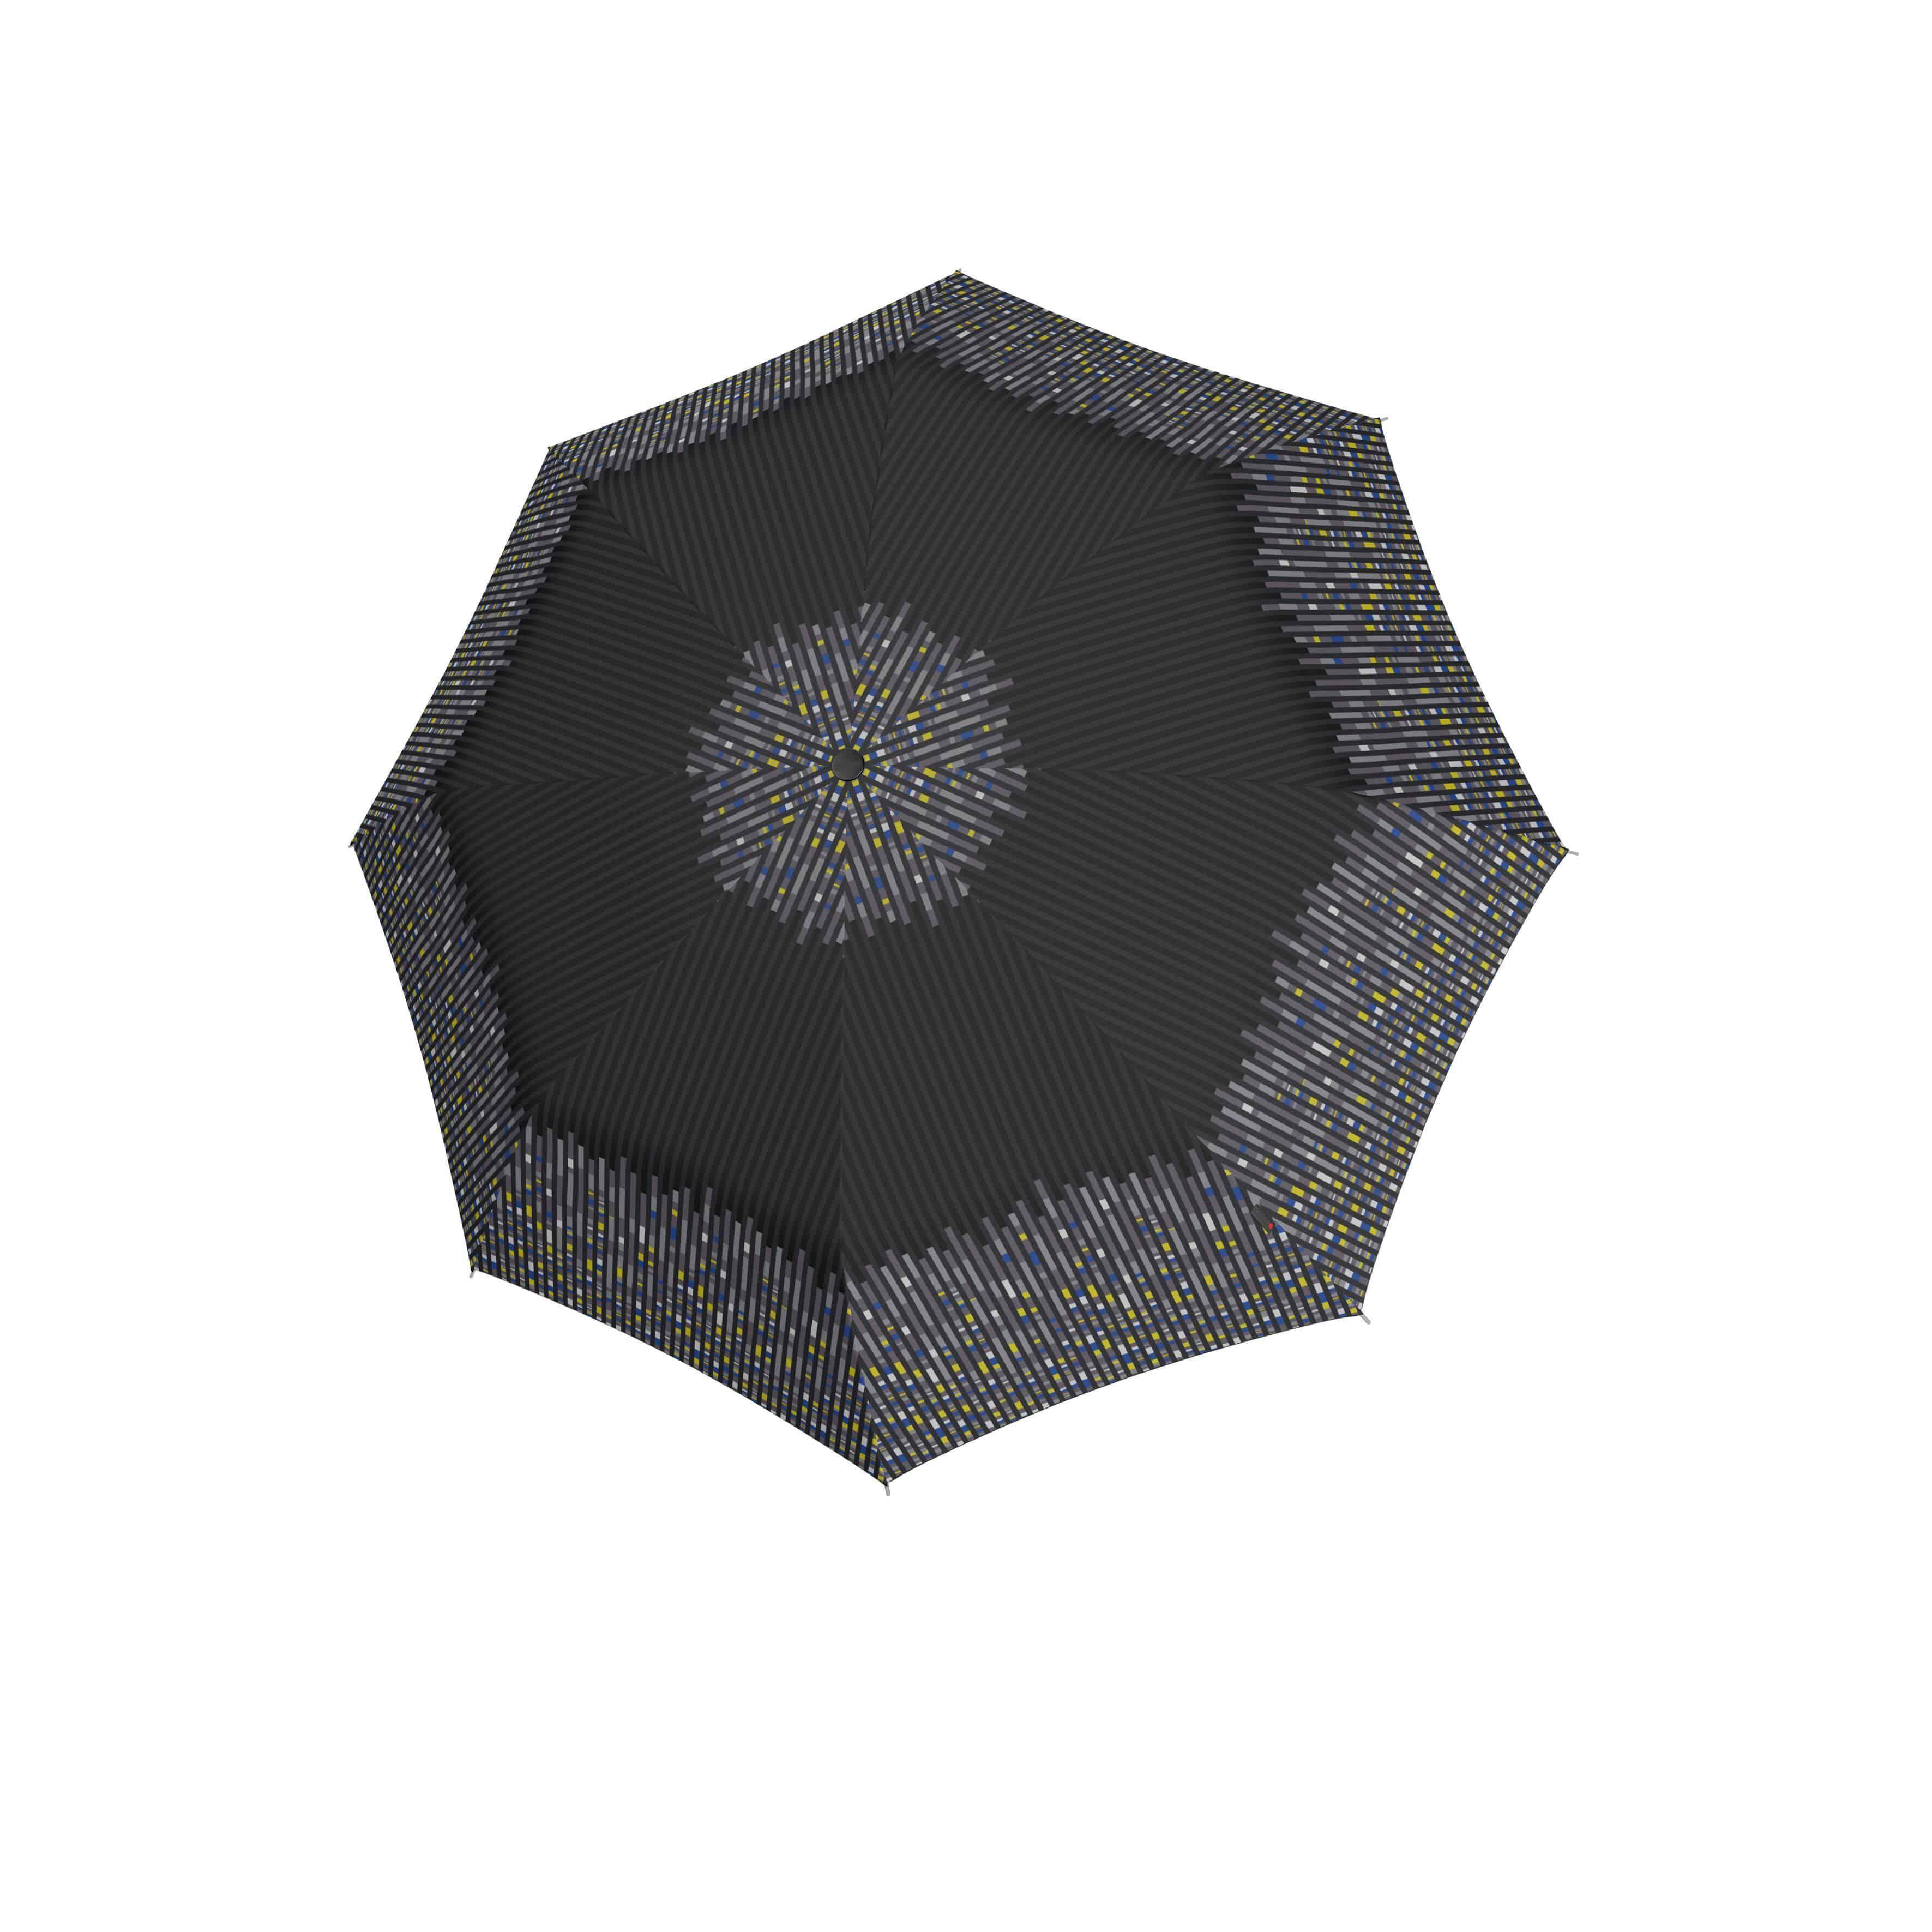 Knirps Umbrella Knirps T.200 medium duomatic unity black ecorepel